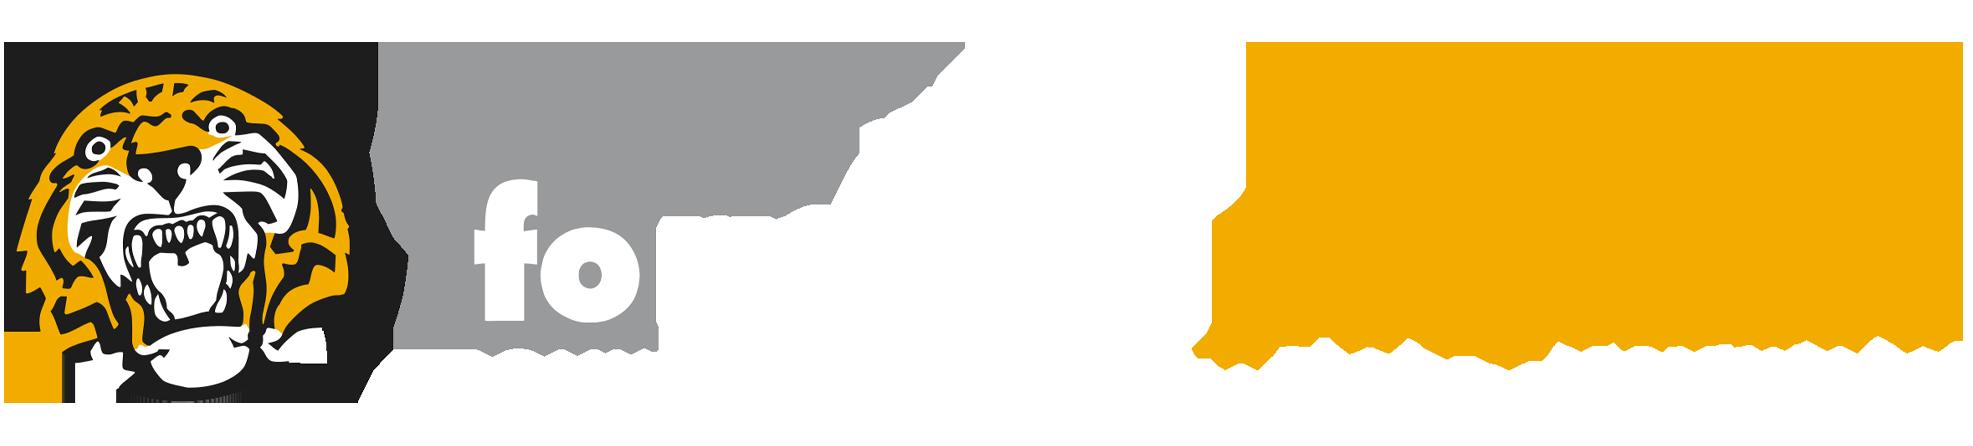 Fornaroli Polymers